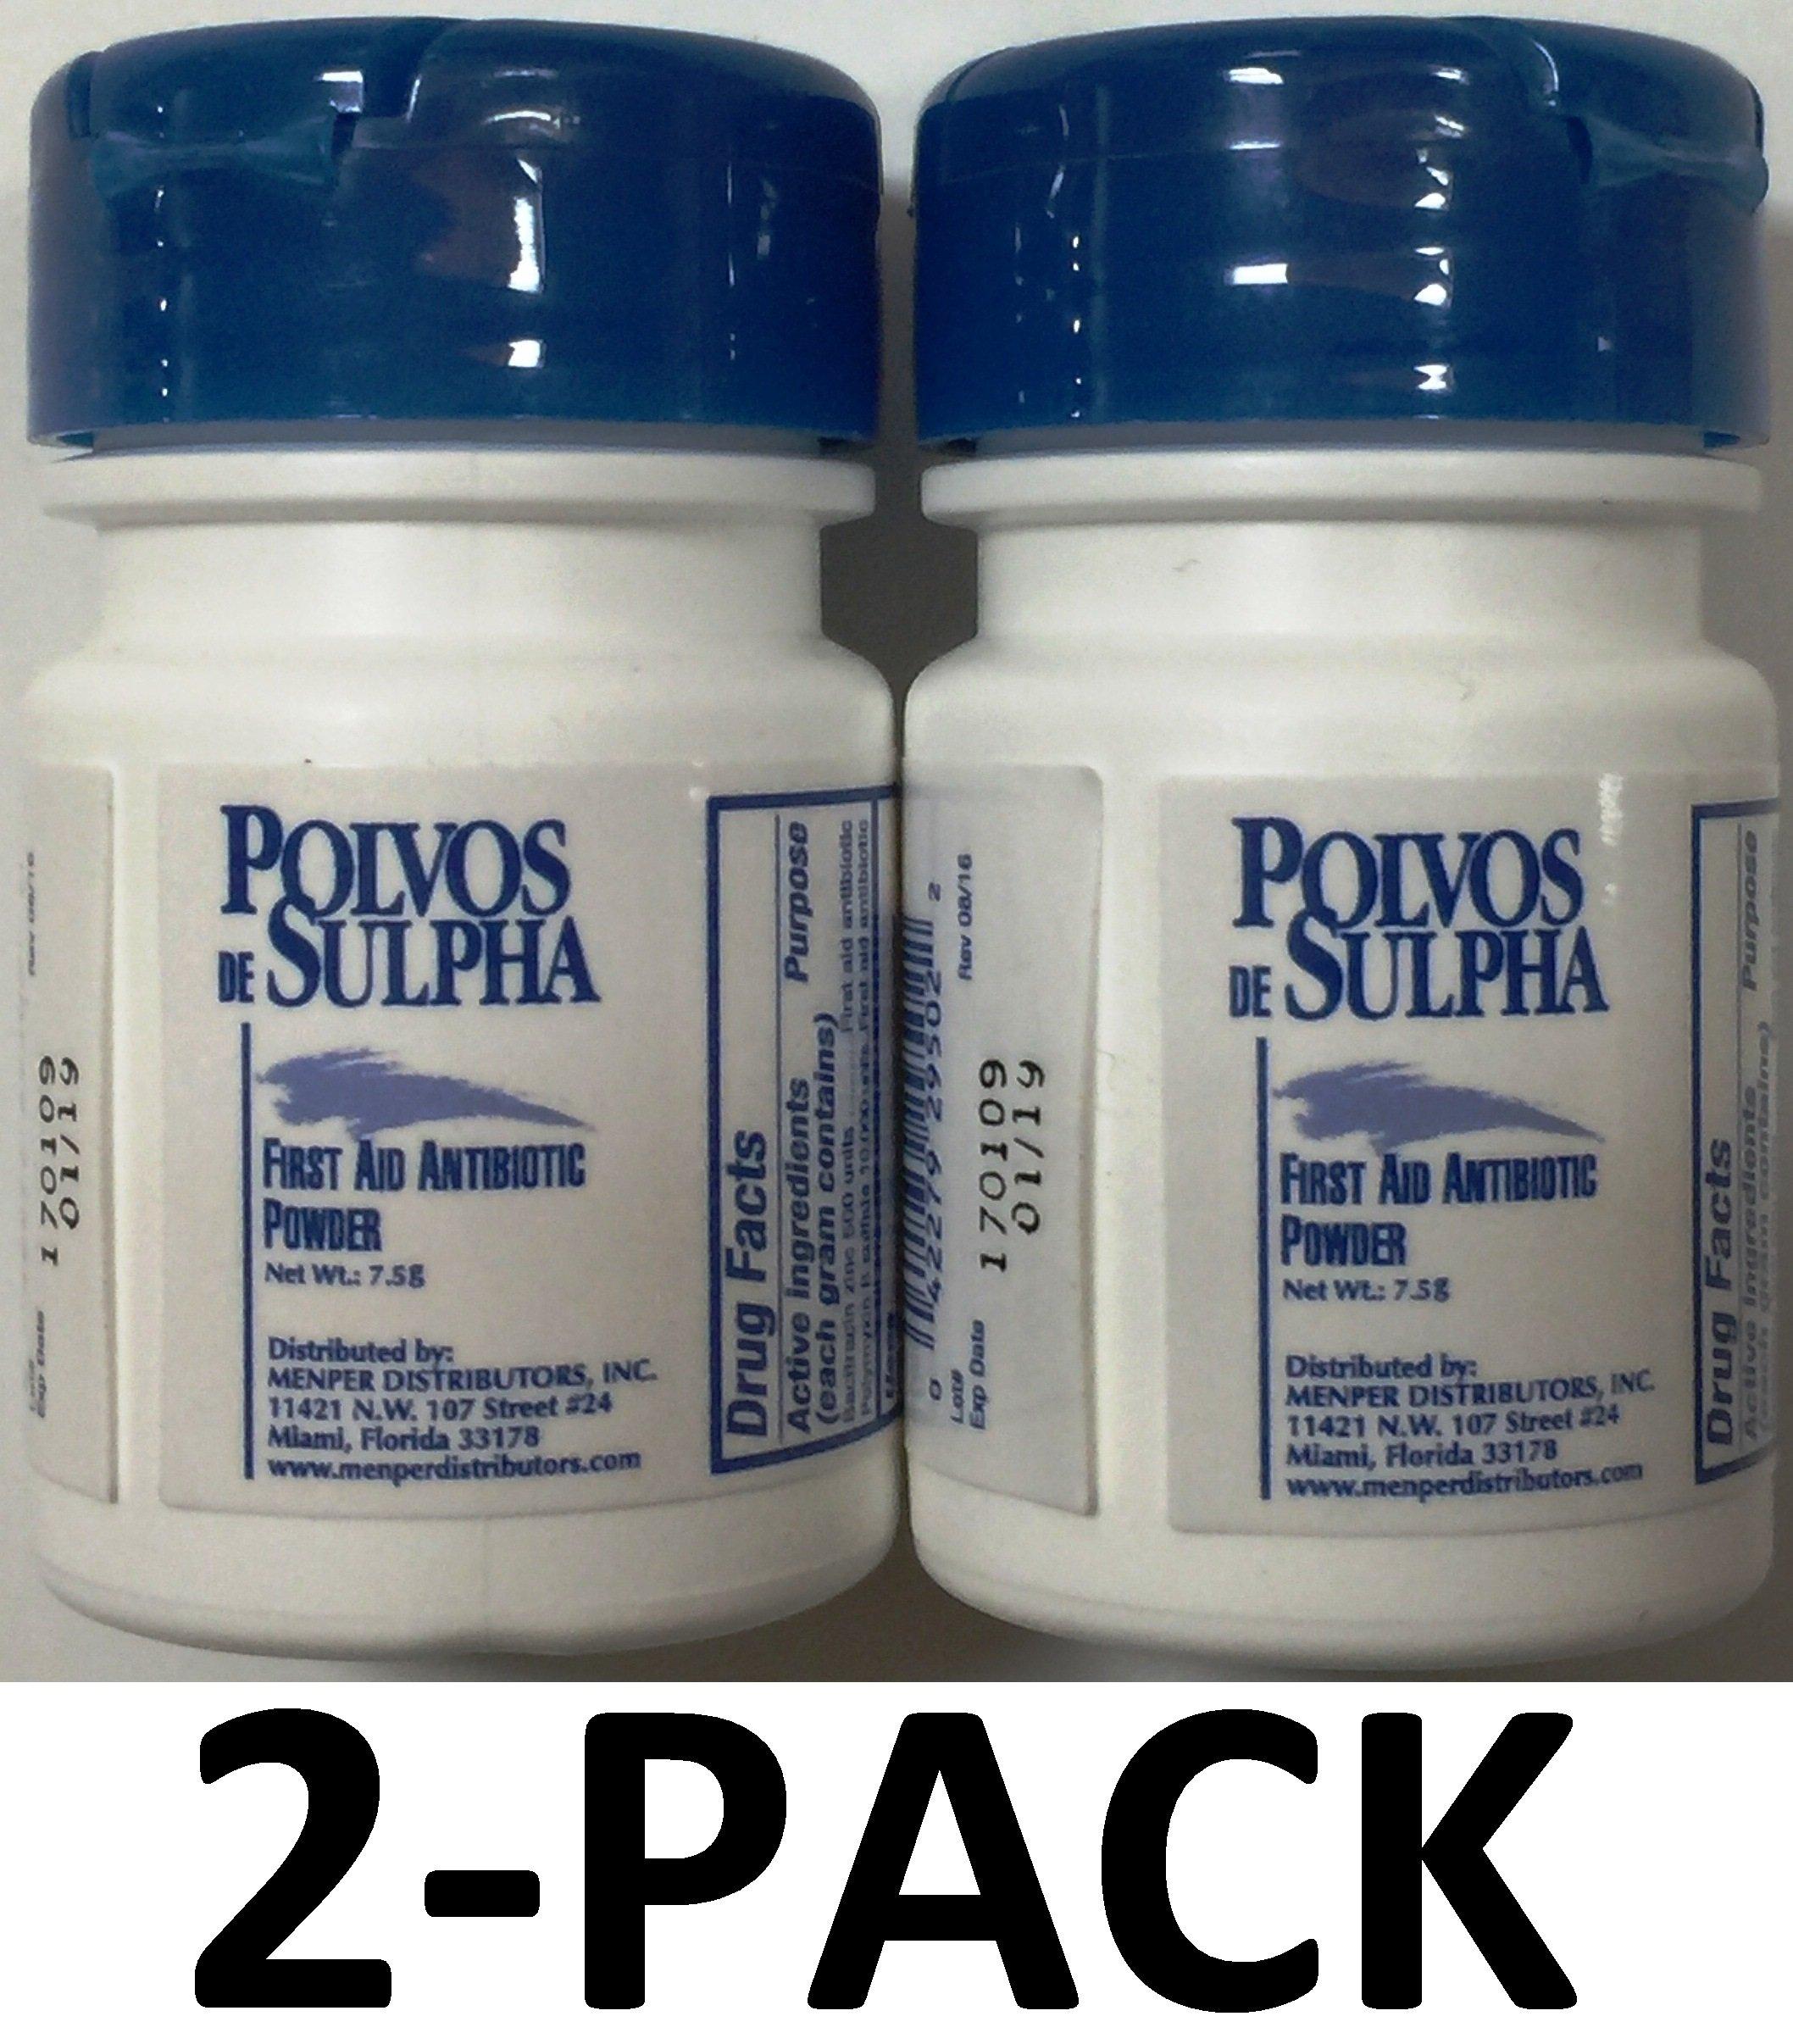 Polvos de Sulpha 7.5 gm.69 oz. First Aid Antibiotic Powder 2-Pack